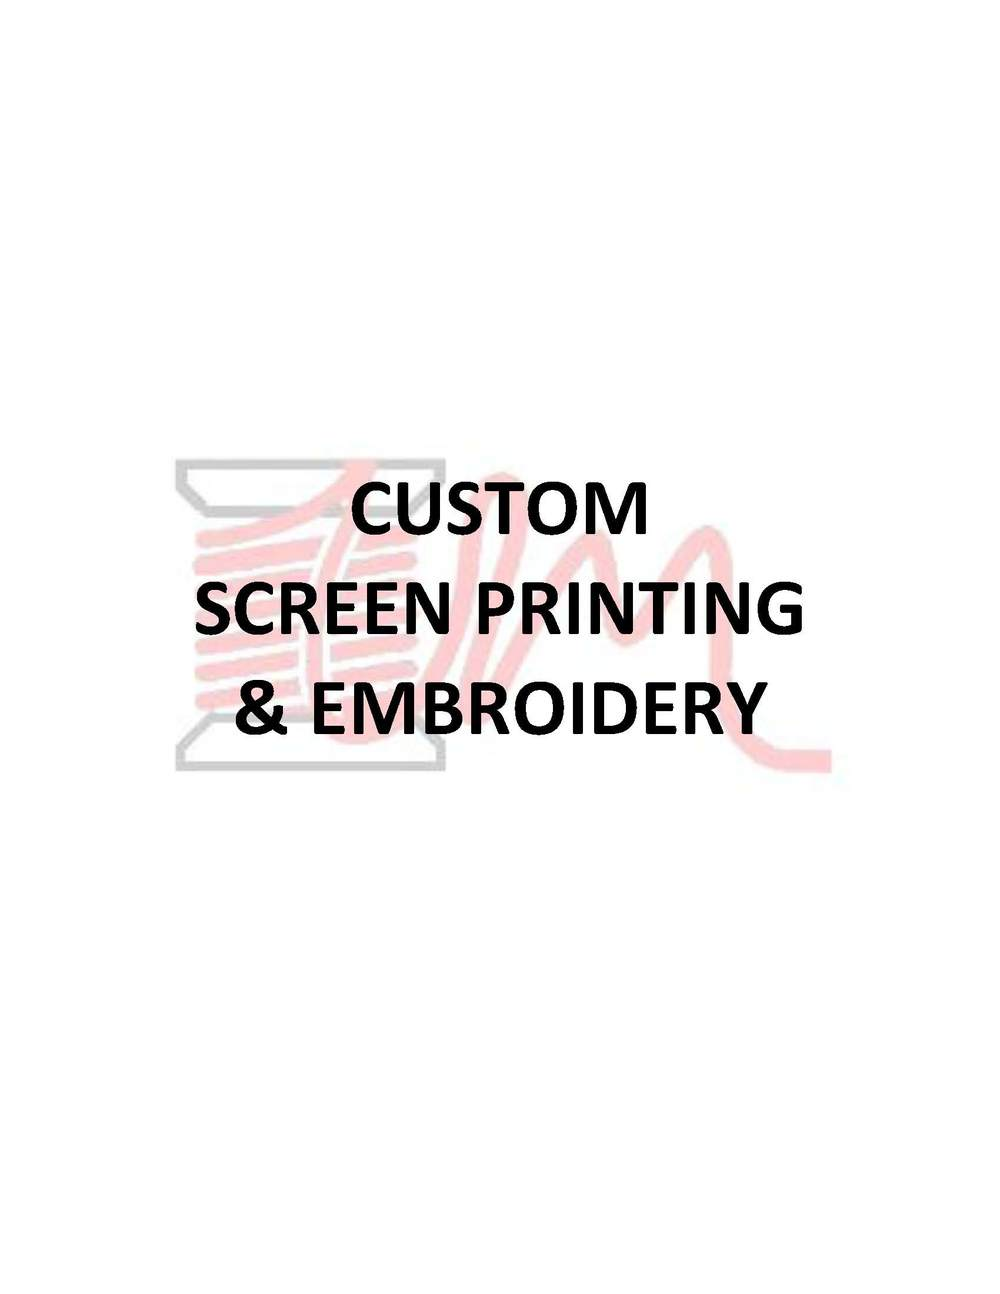 Custom ScreenPrinting & Embroidery Icon.jpg